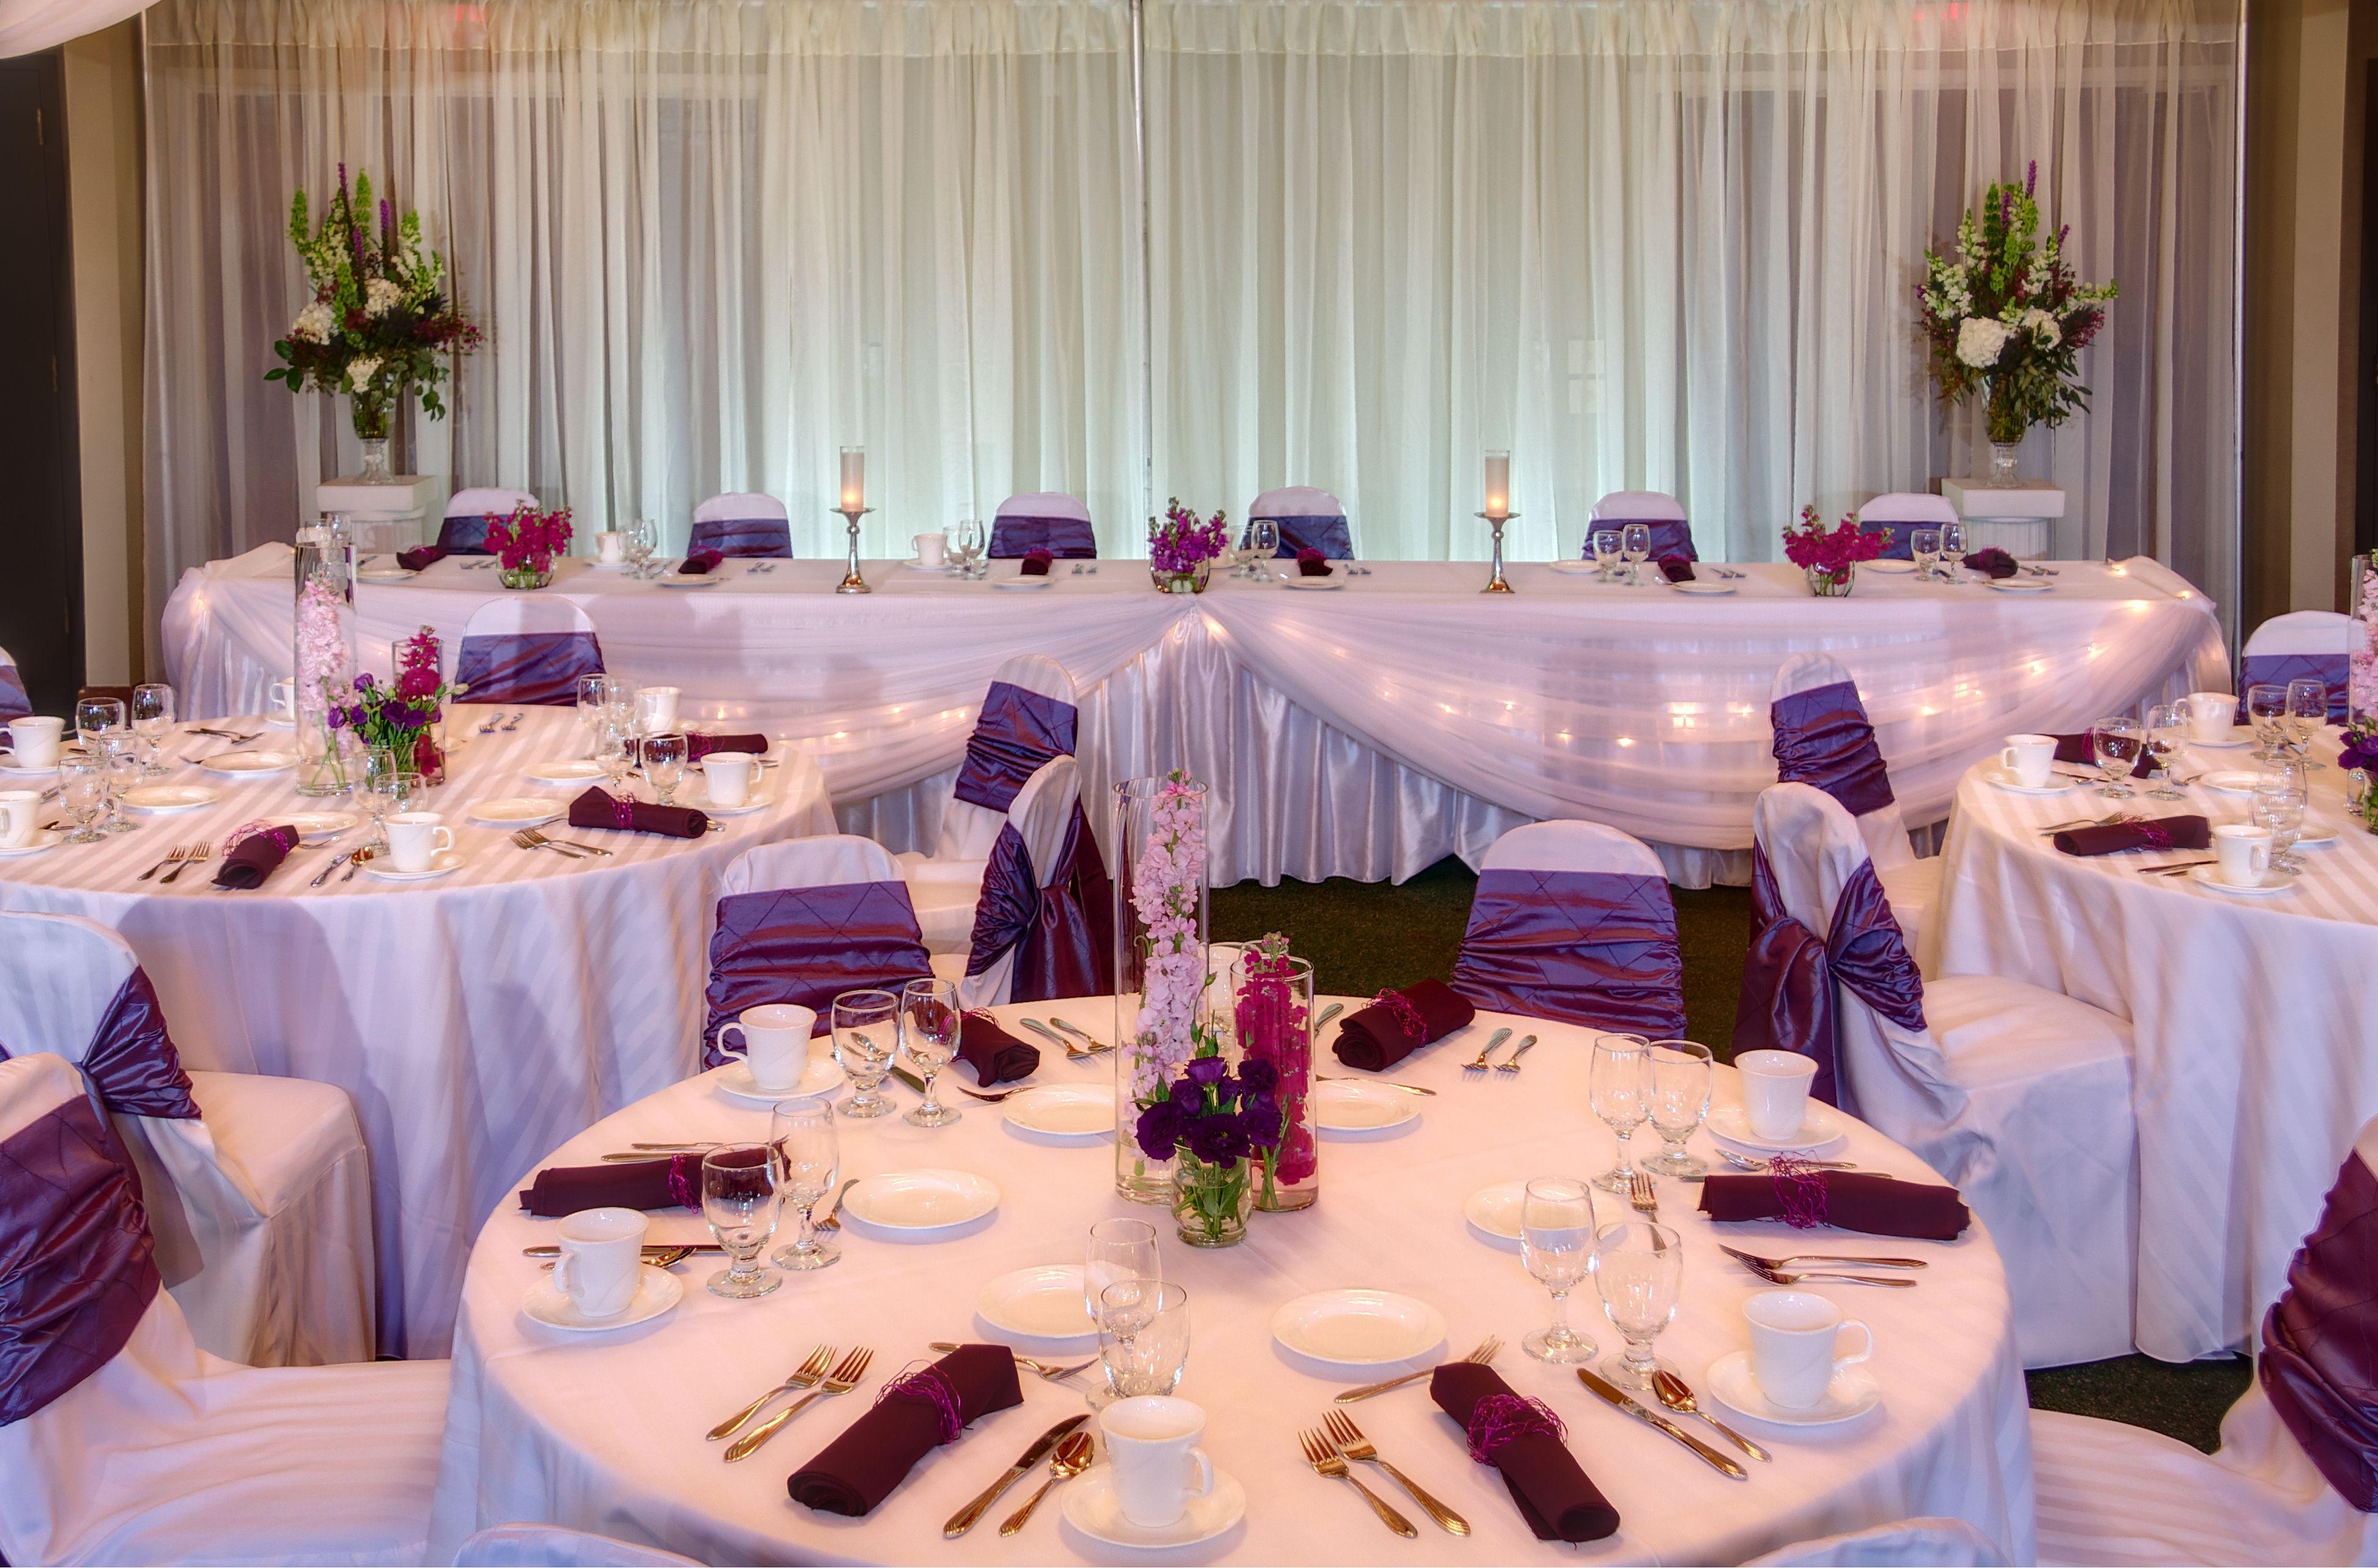 Wedding reception, purple accent colors